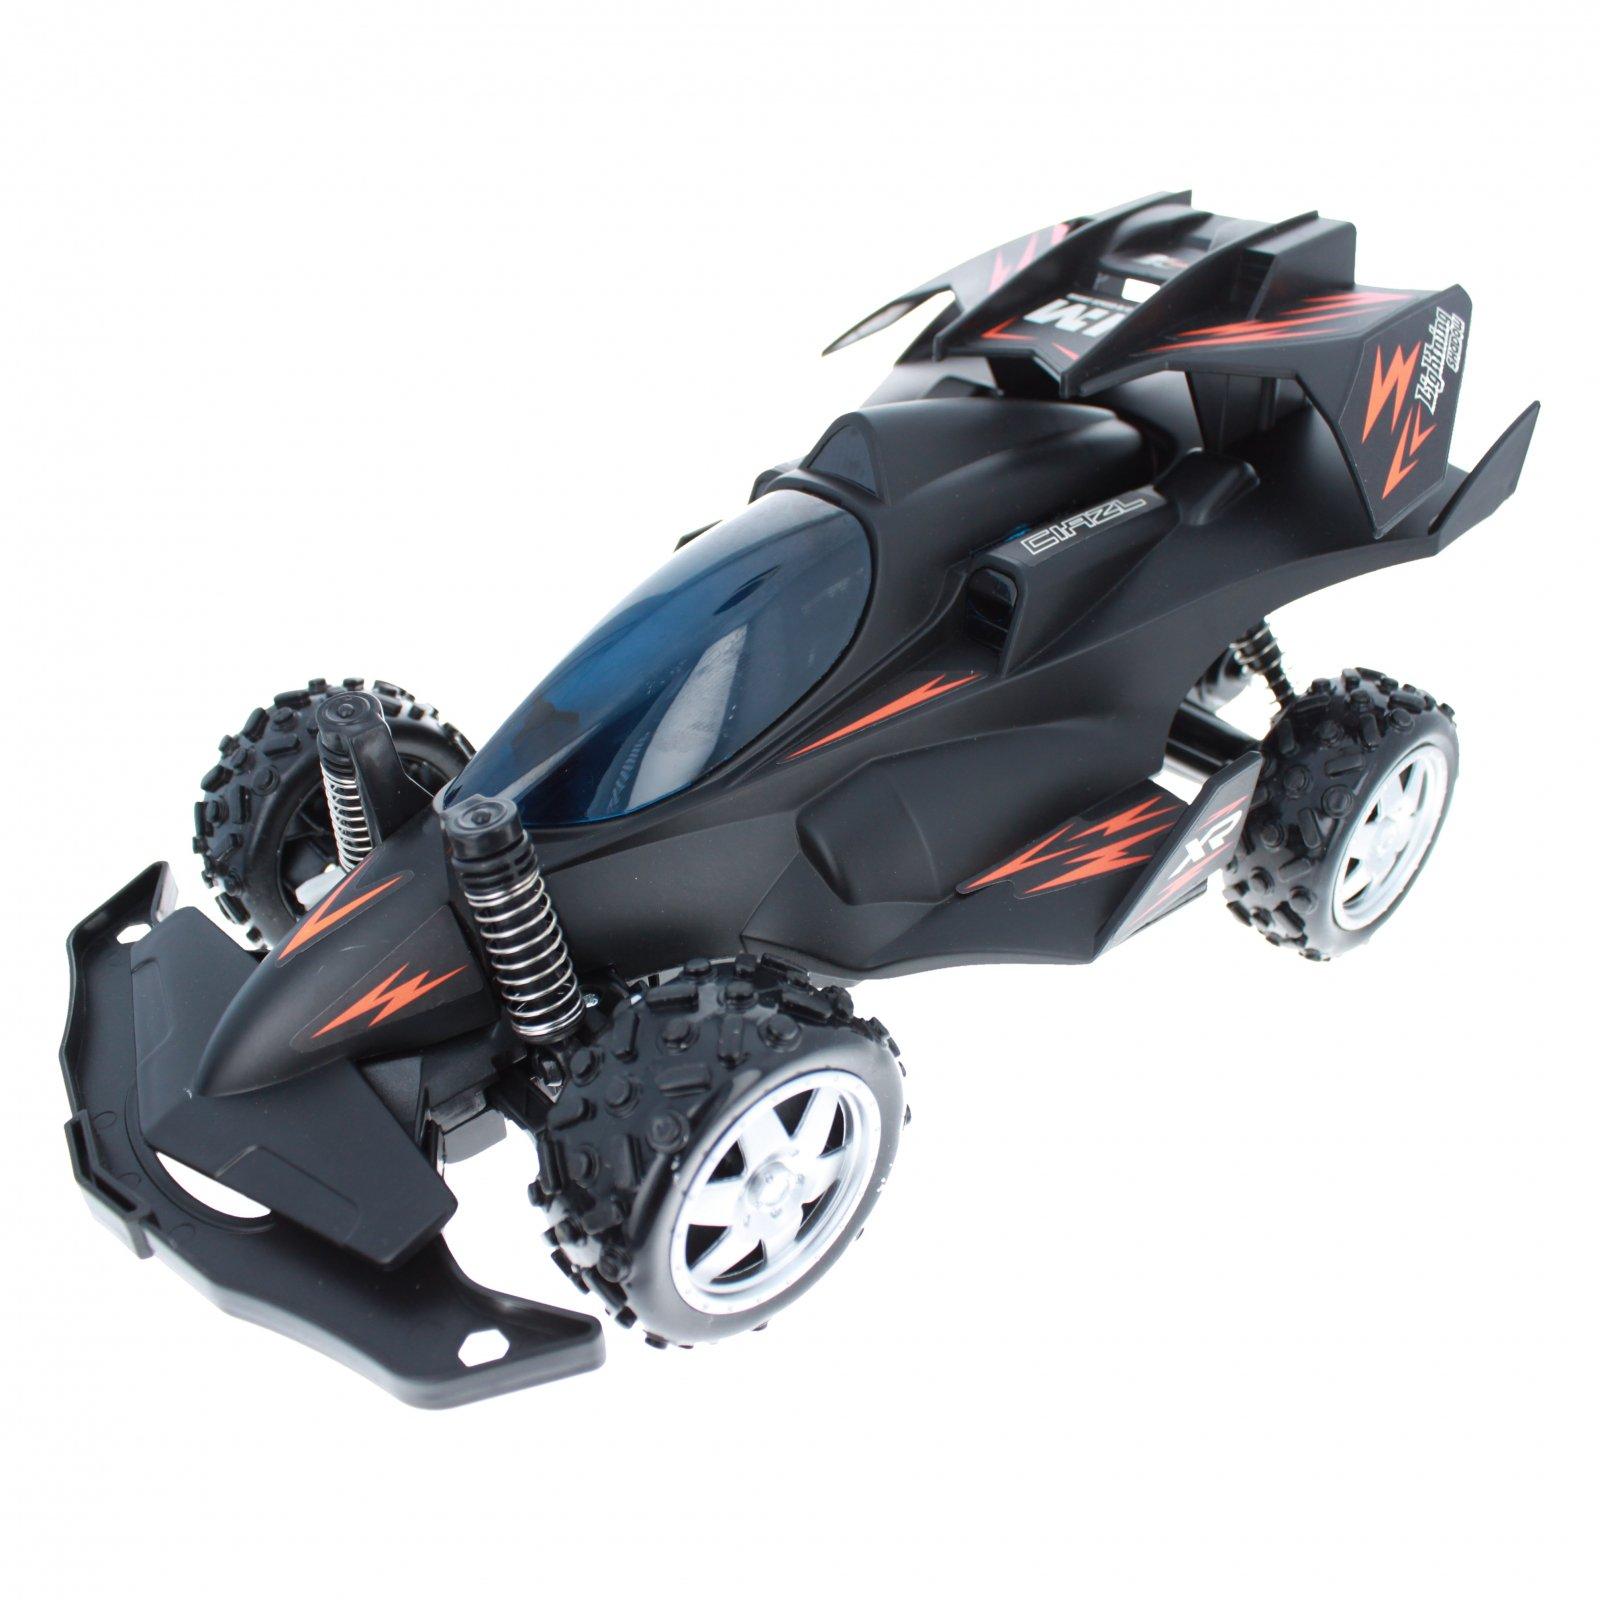 High Speed R/C Dune Buggy Vehicle - Black